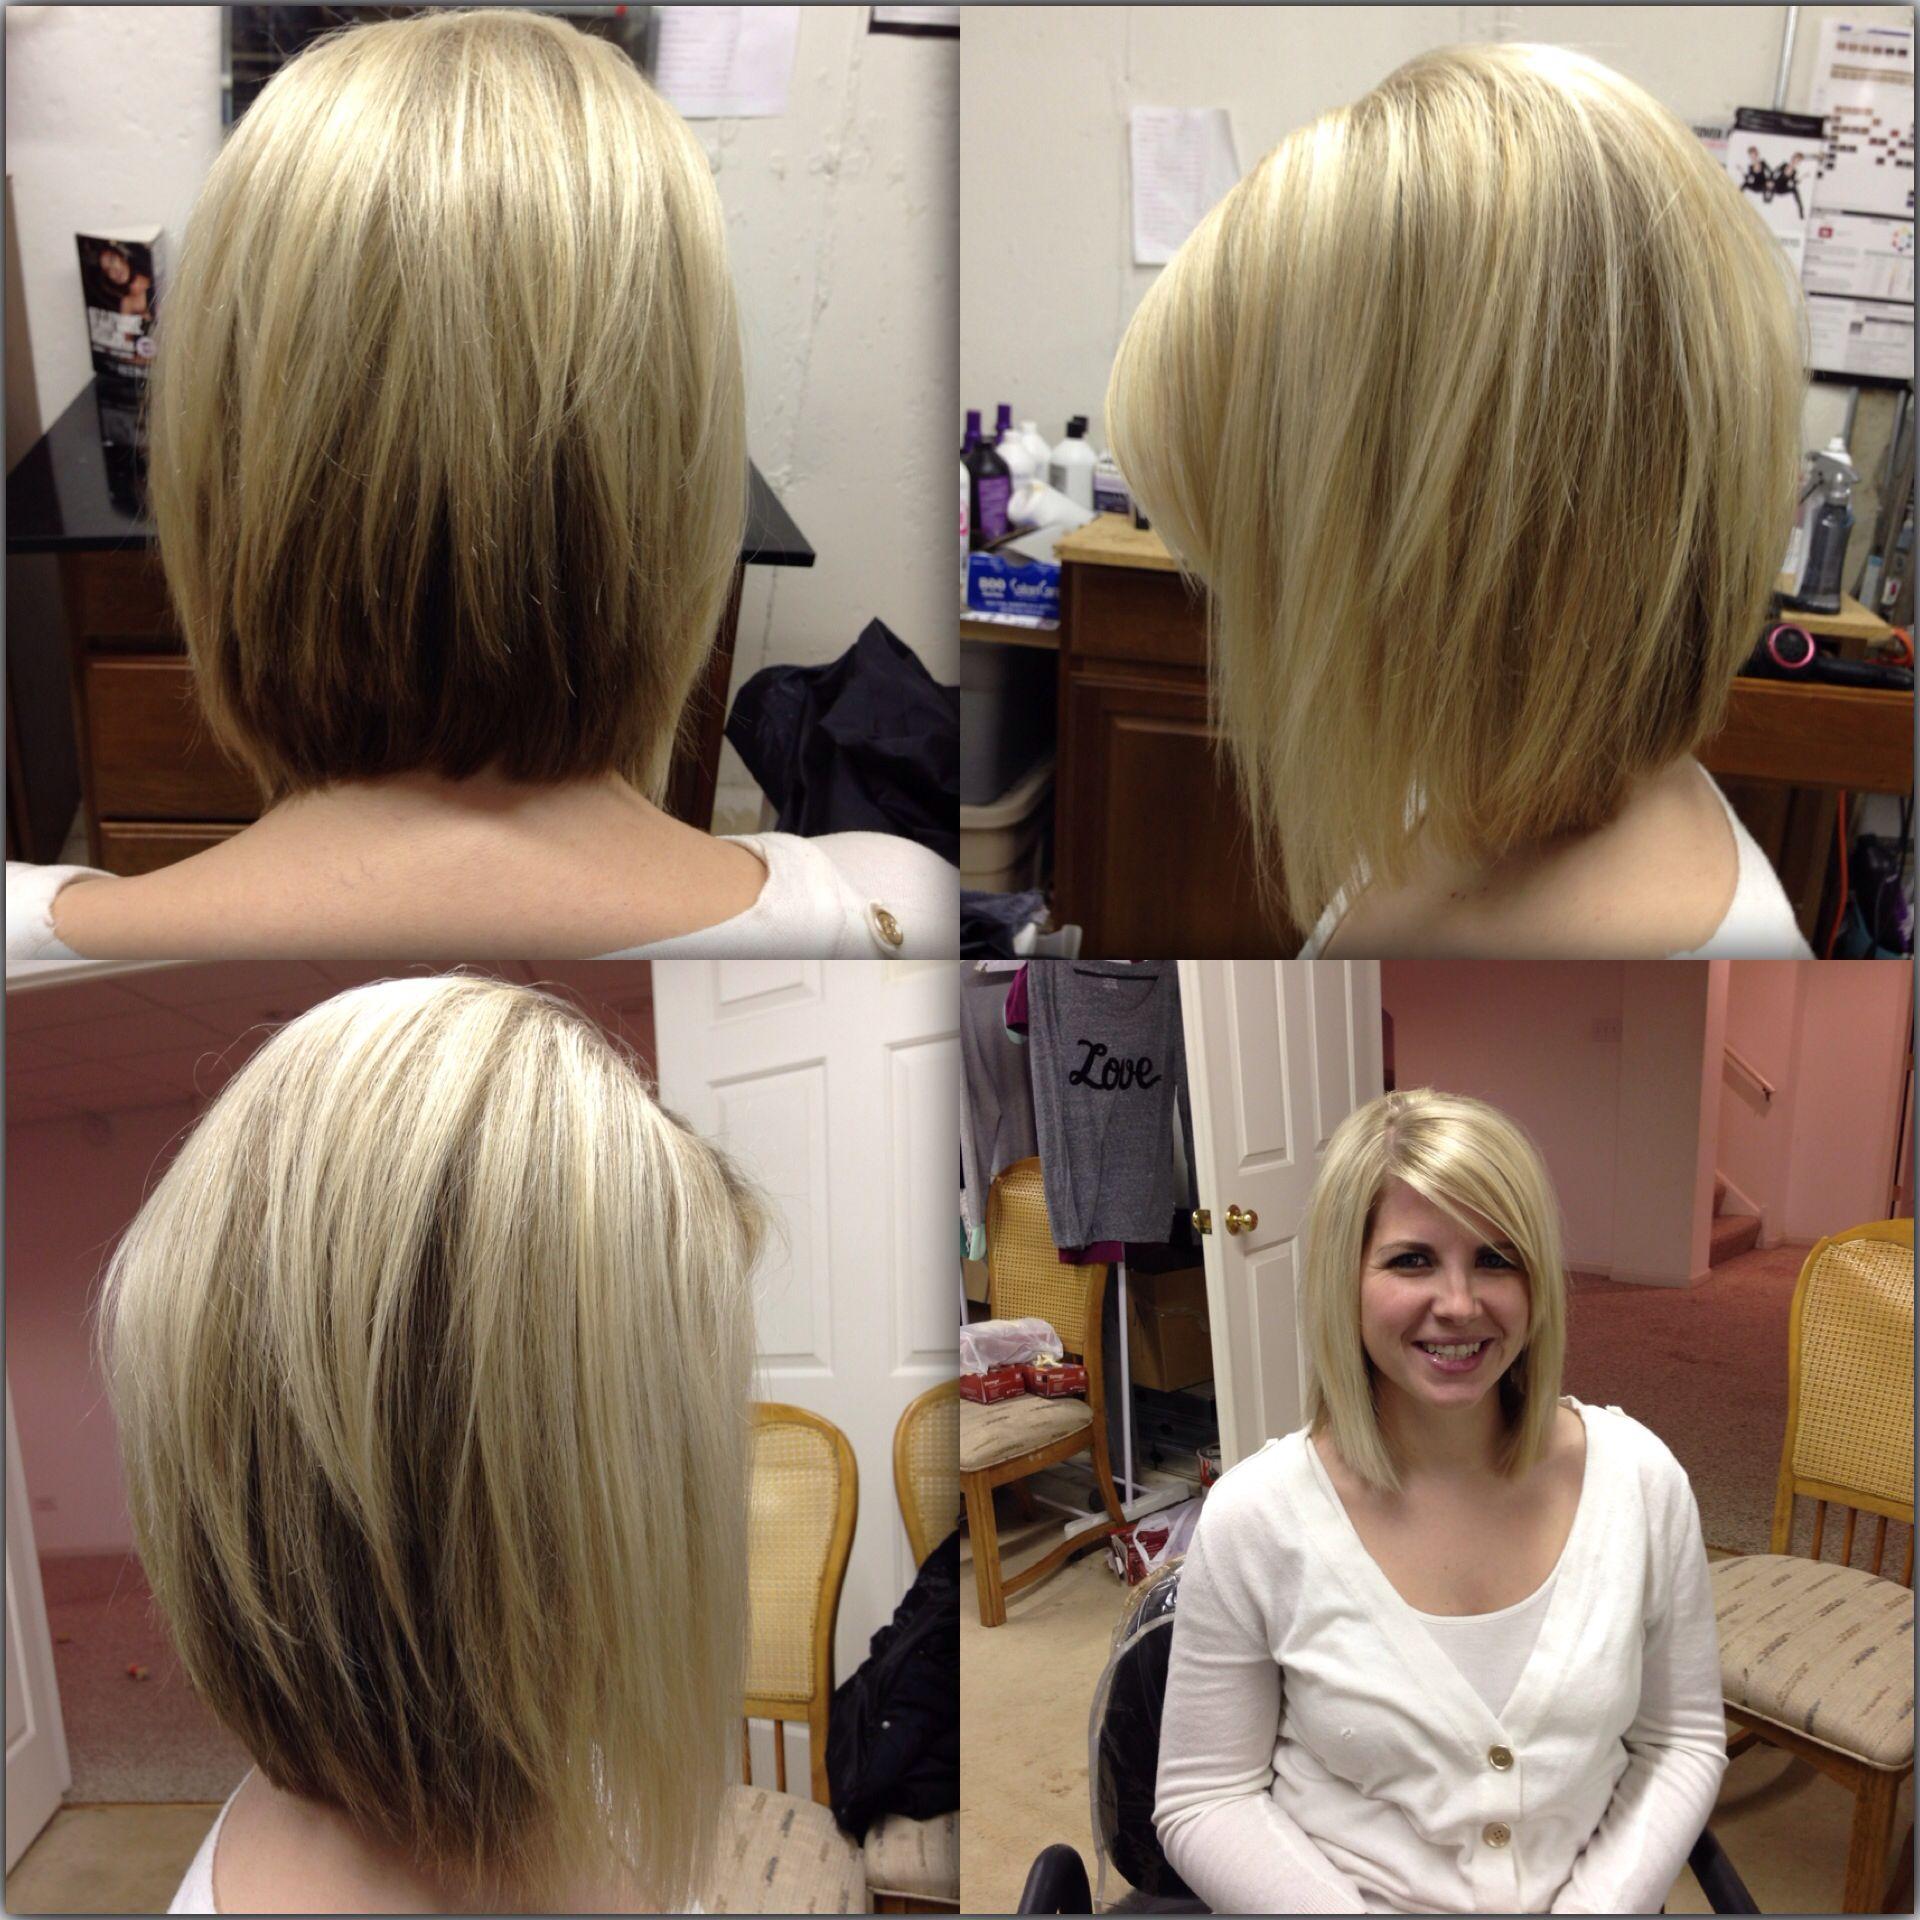 angled bobs with bangs | razor cut bob, razor cuts and platinum blonde